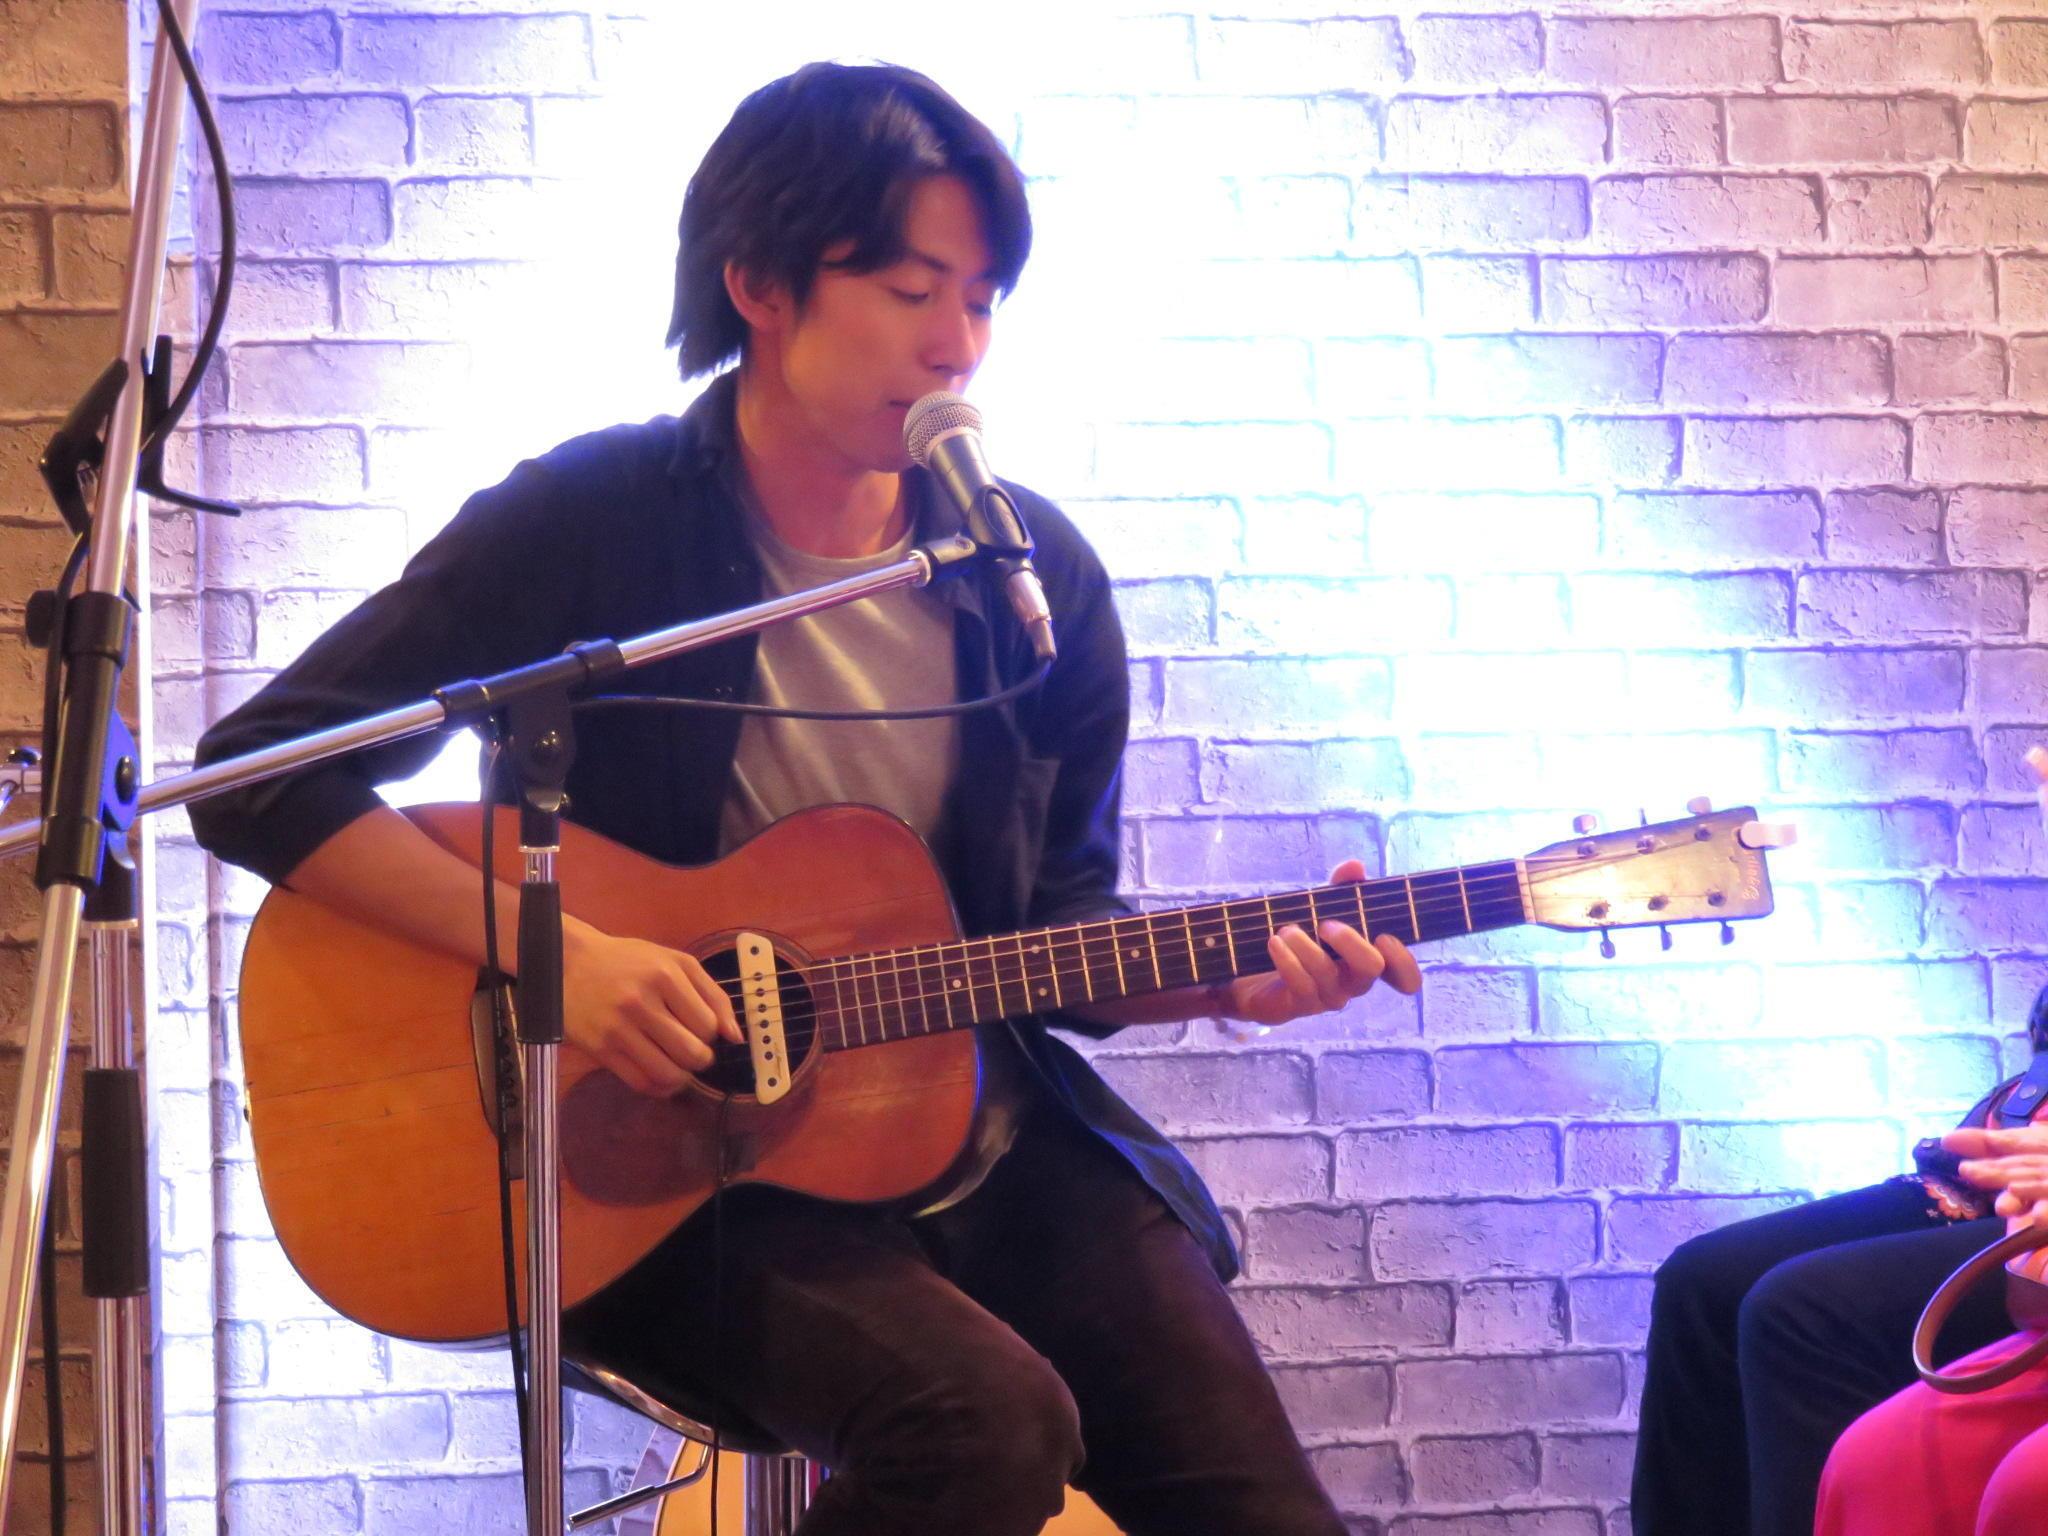 http://news.yoshimoto.co.jp/20170531173148-0960e121ddee251e8e5efcc7afb35321e99aa398.jpg